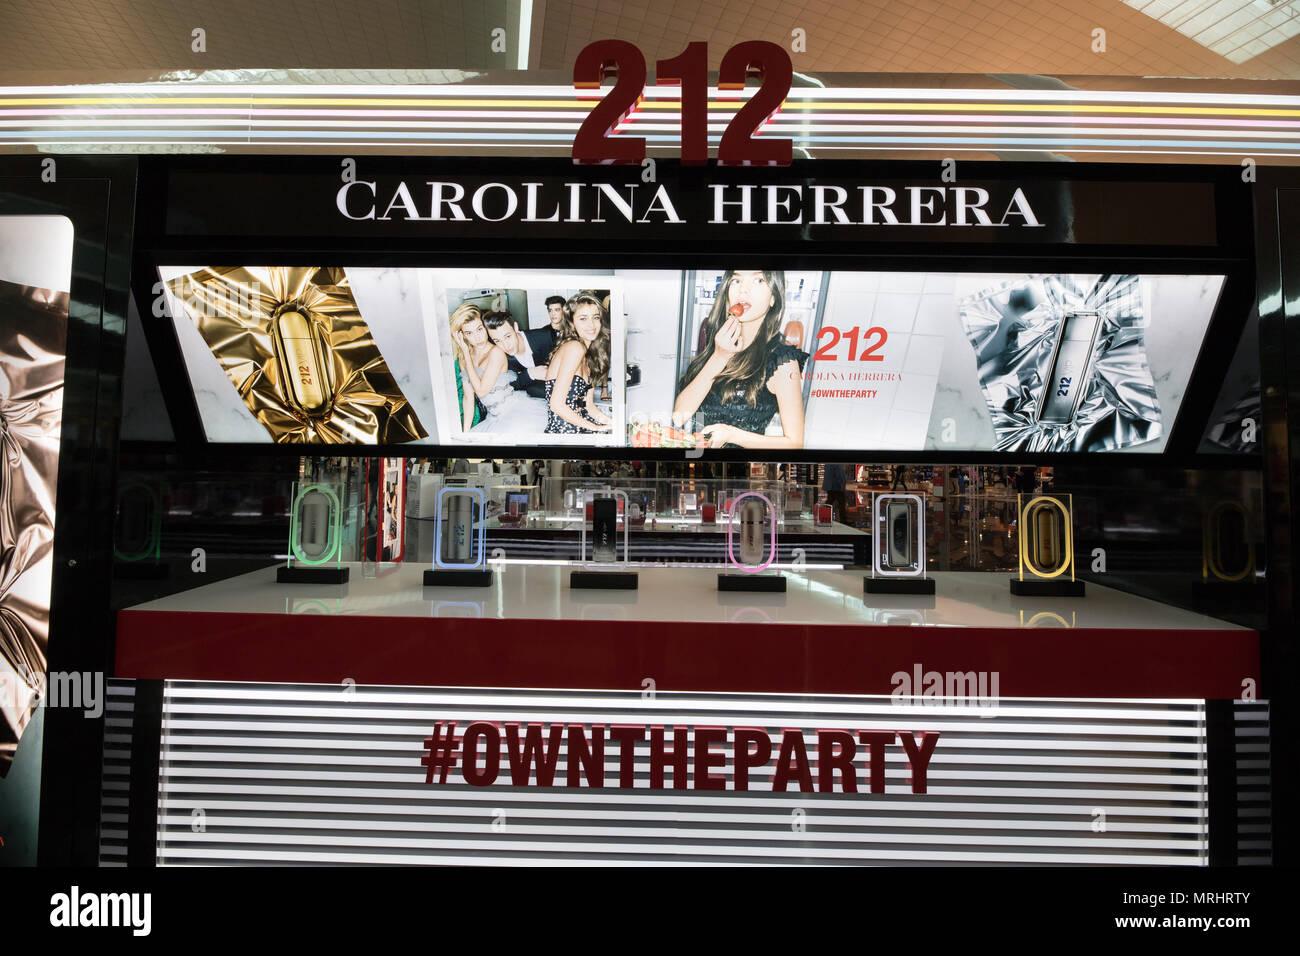 Barcelona airport, Spain CAROLINA HERRERA store business - Stock Image 79e218881e